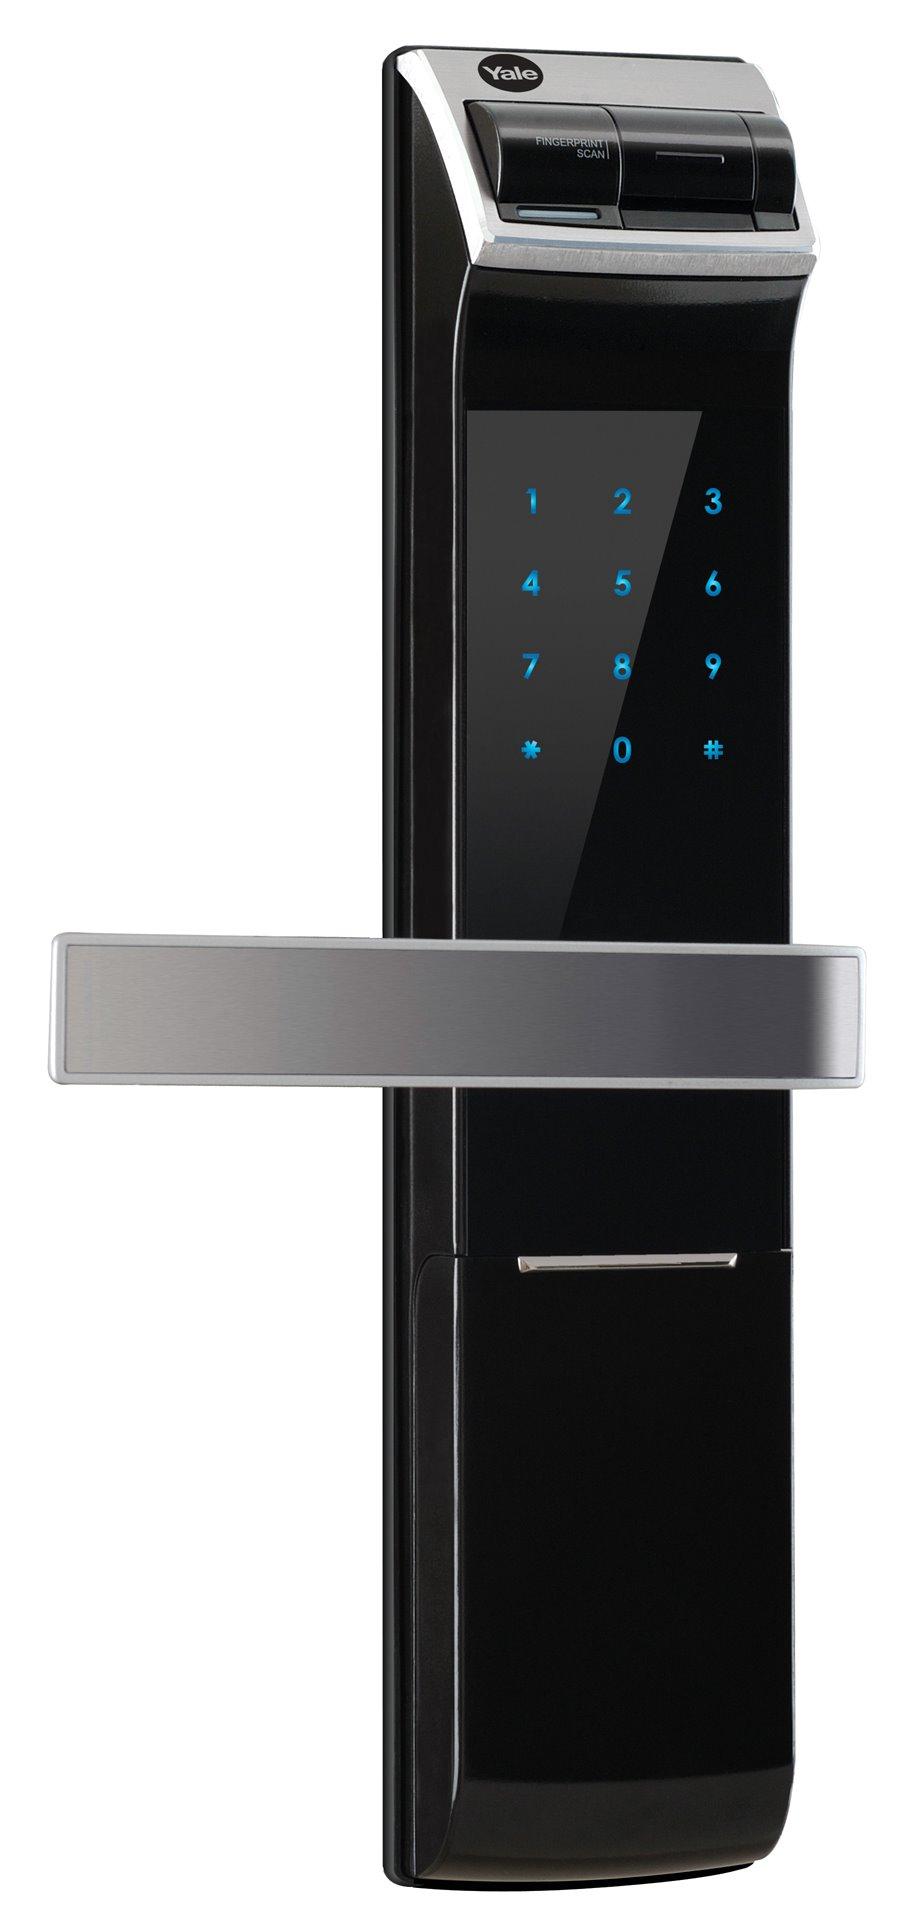 Ydm 4109 Biometric Fingerprint Digital Door Lock